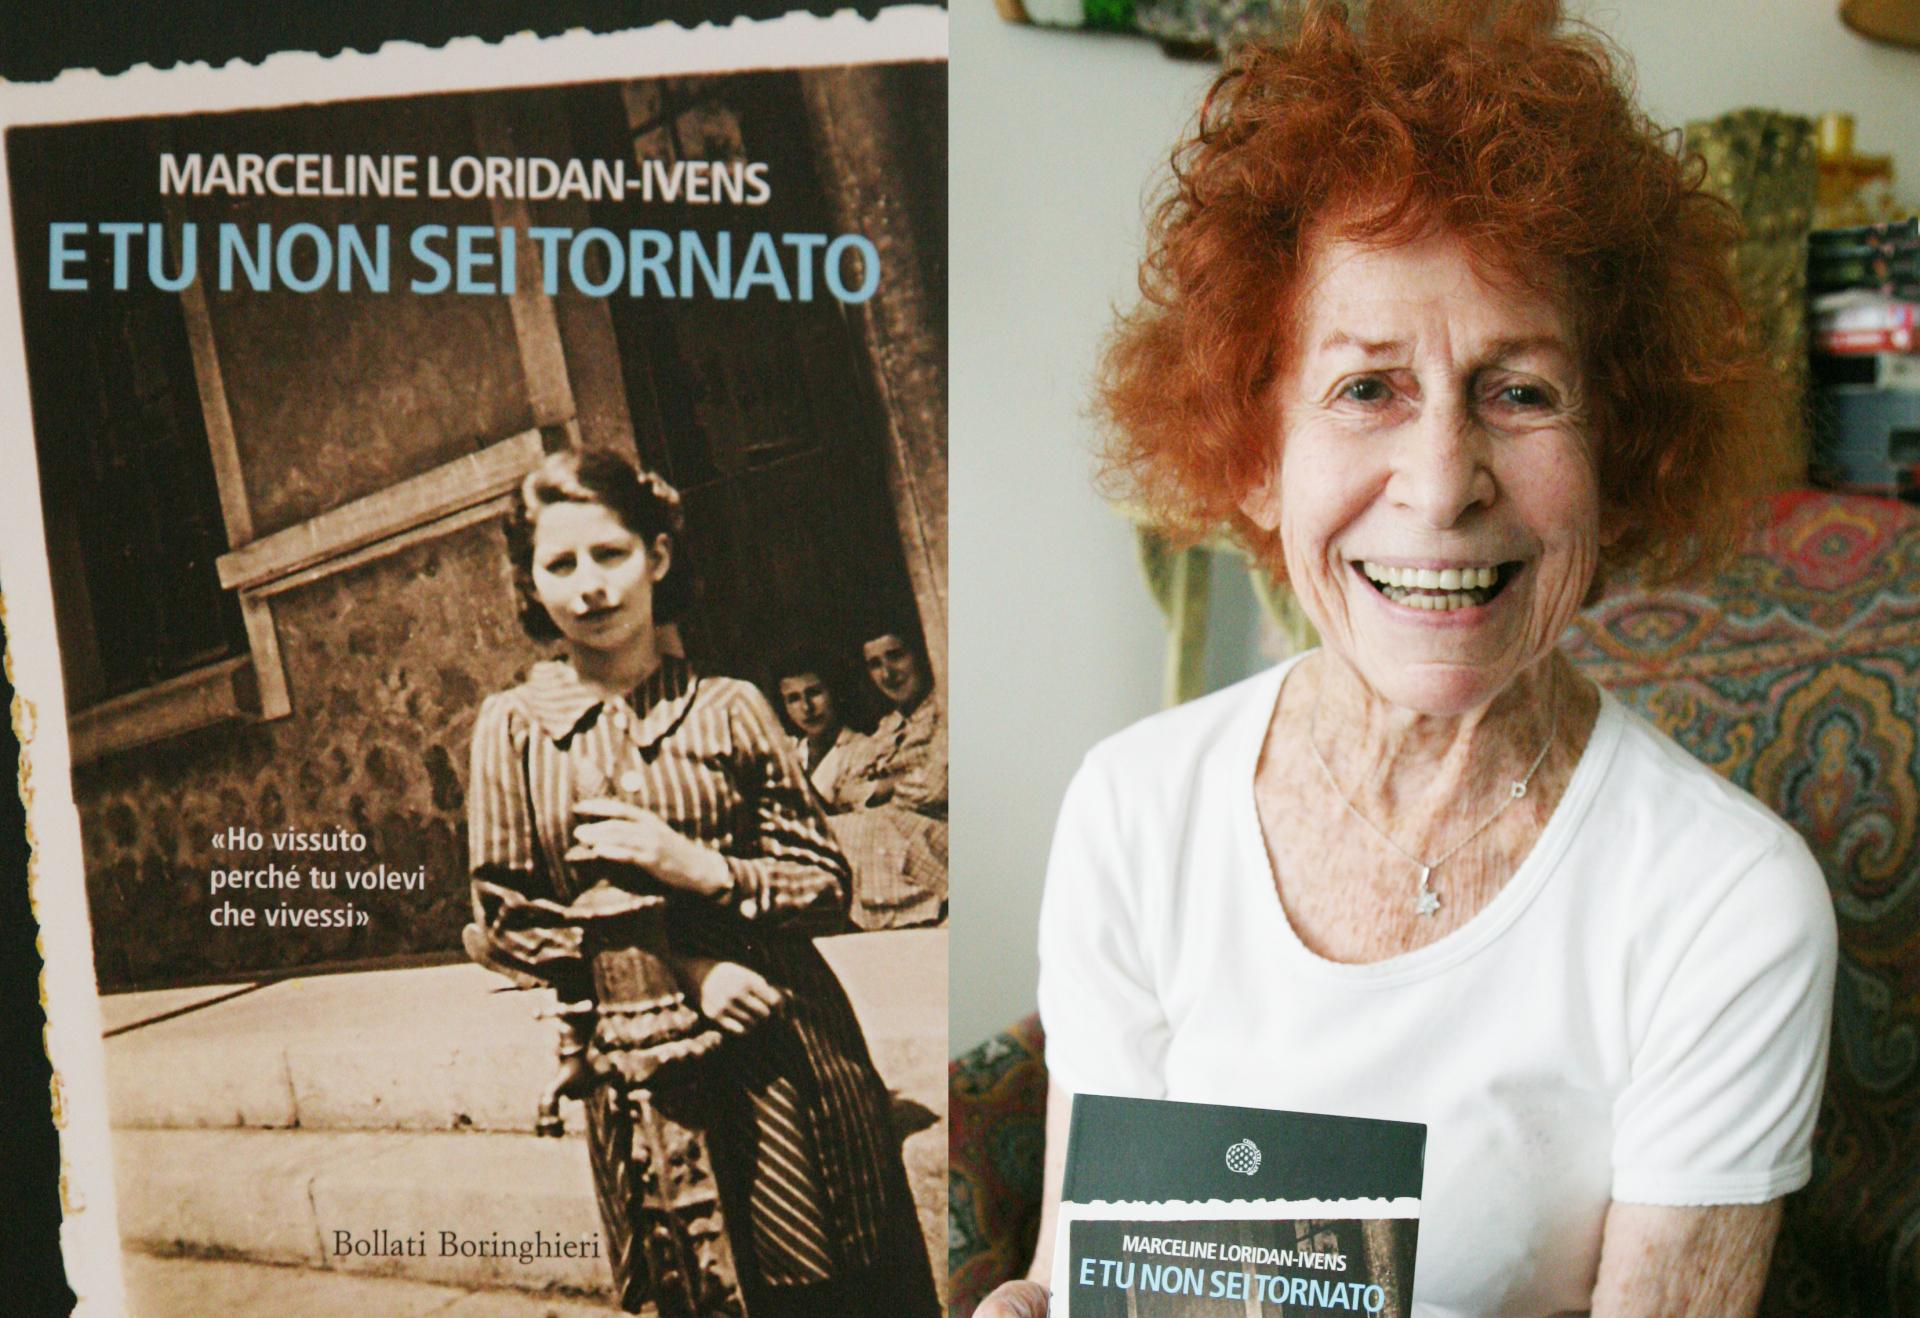 Holocaust Remembrance - Yom Hashoah - Jewish Deportee Marceline Loridan-Ivens